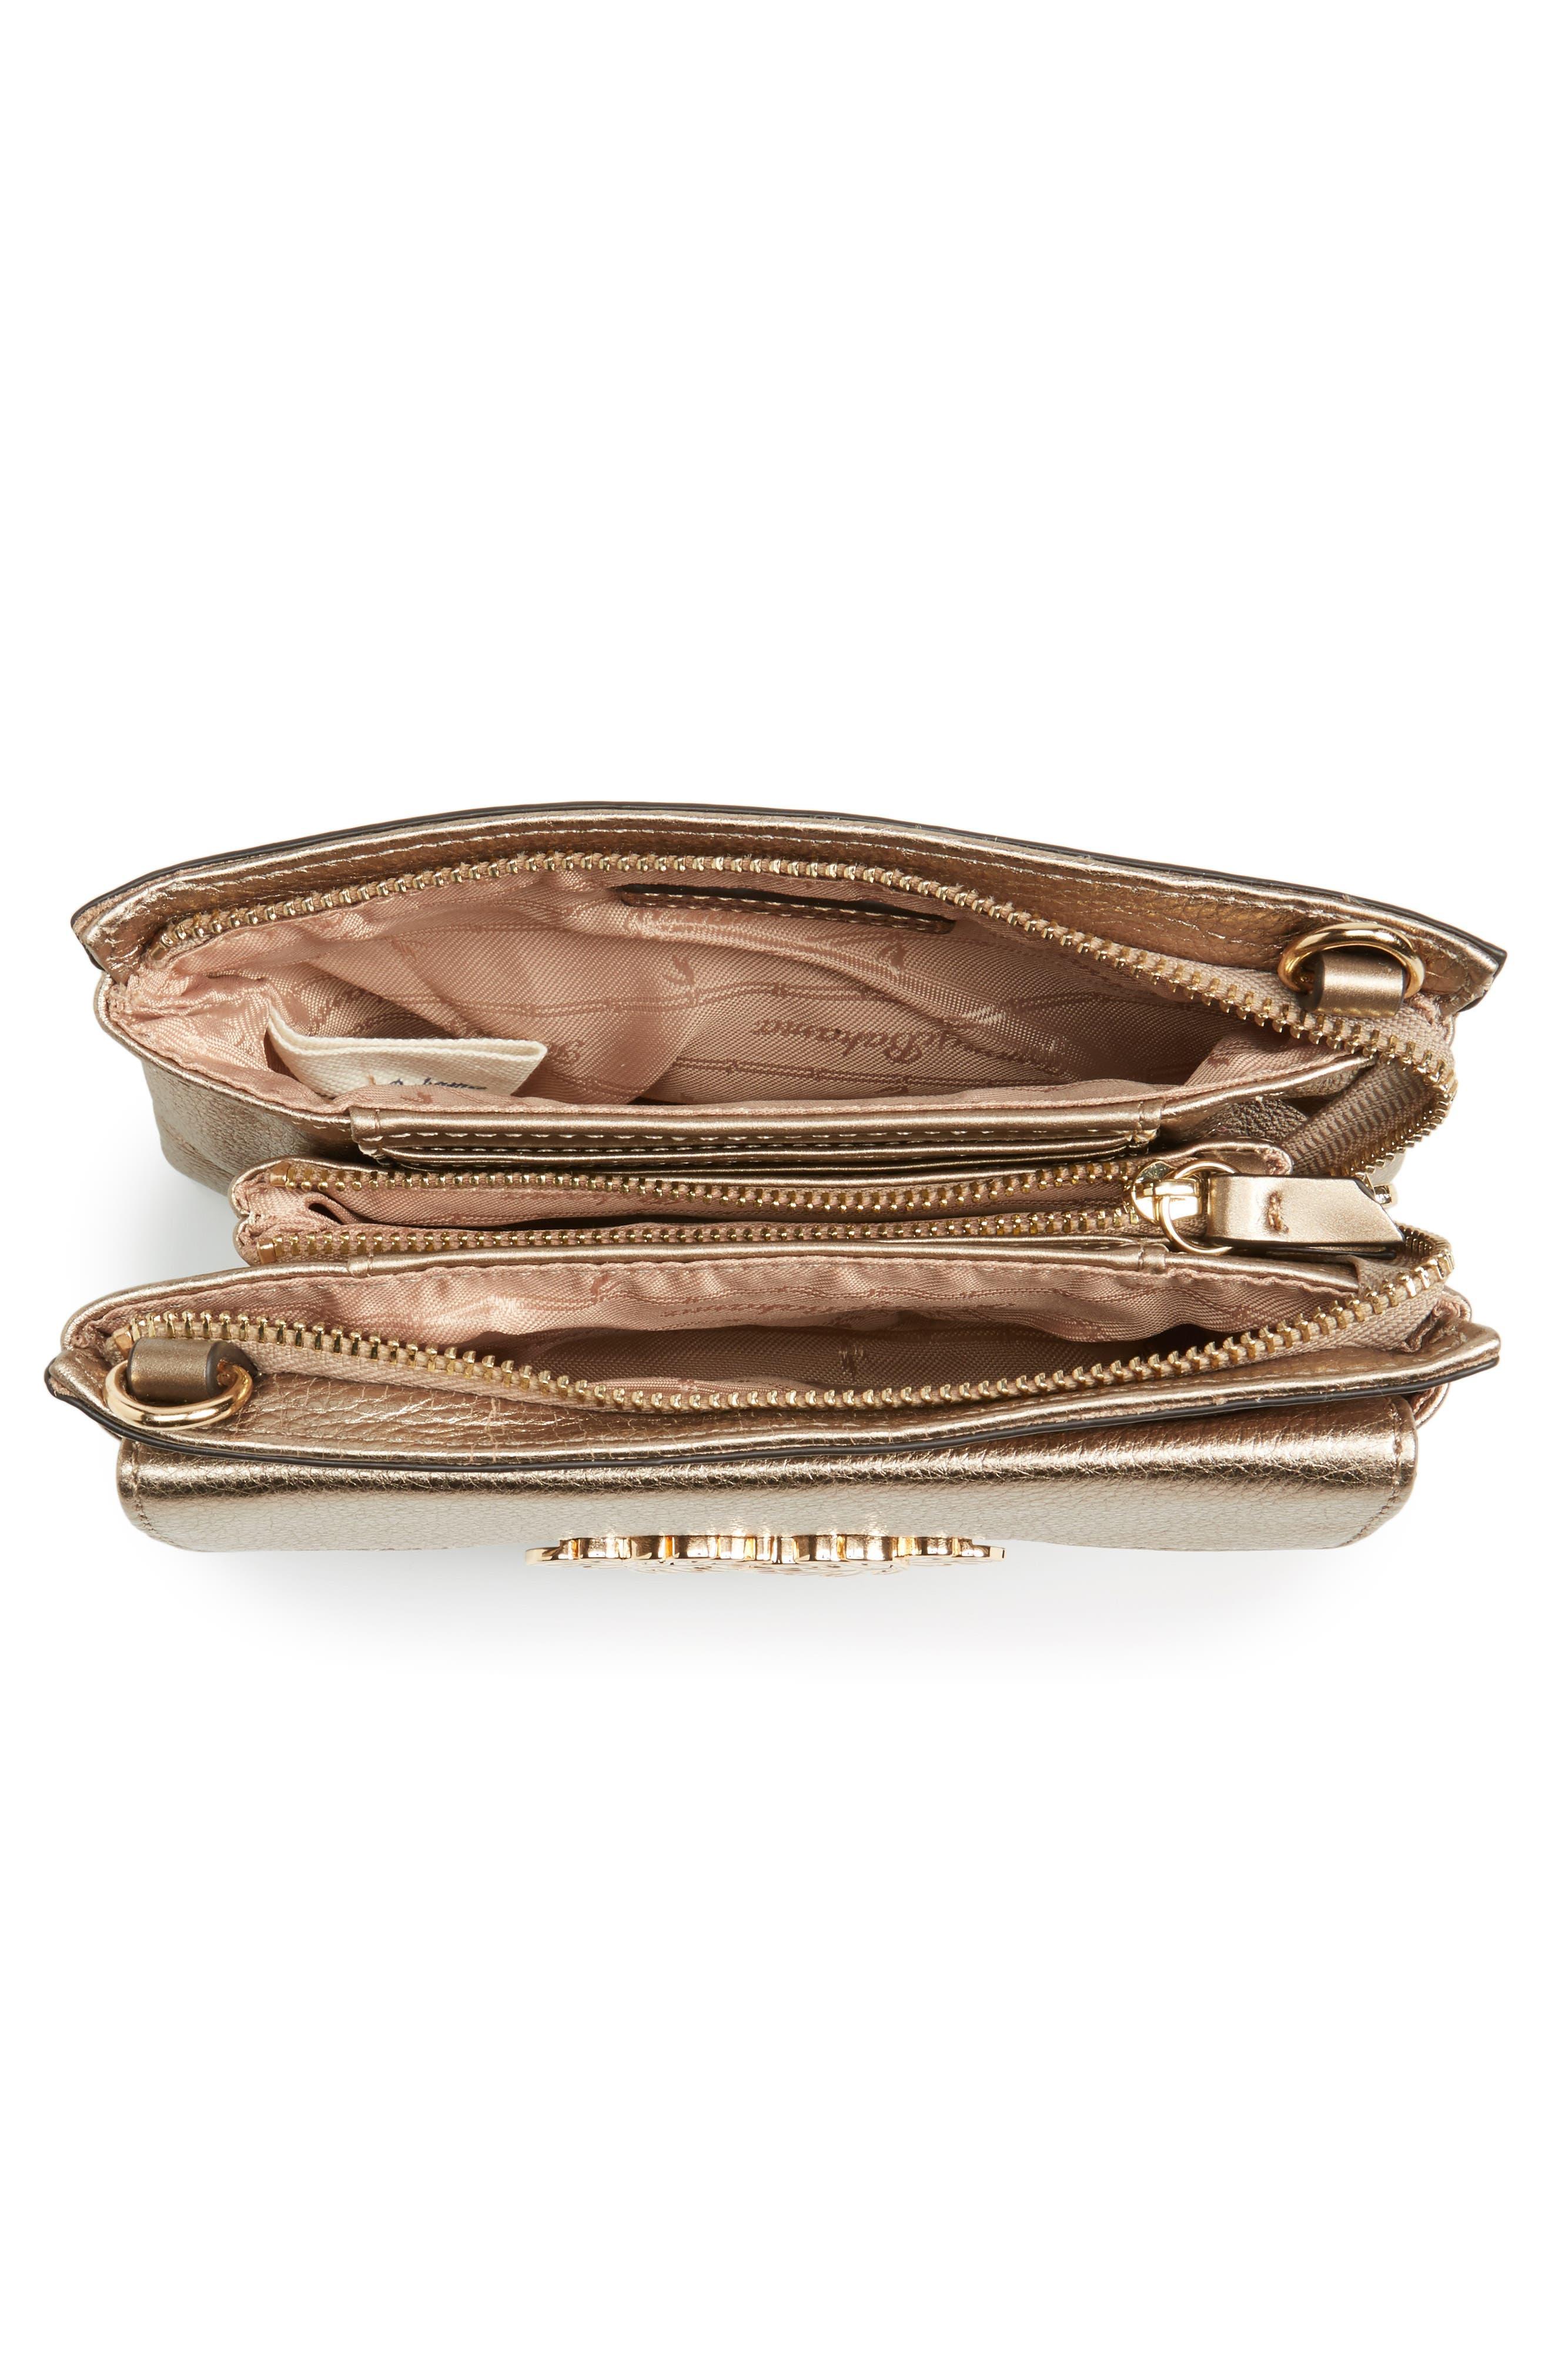 Katerini Leather Crossbody Wallet,                             Alternate thumbnail 20, color,